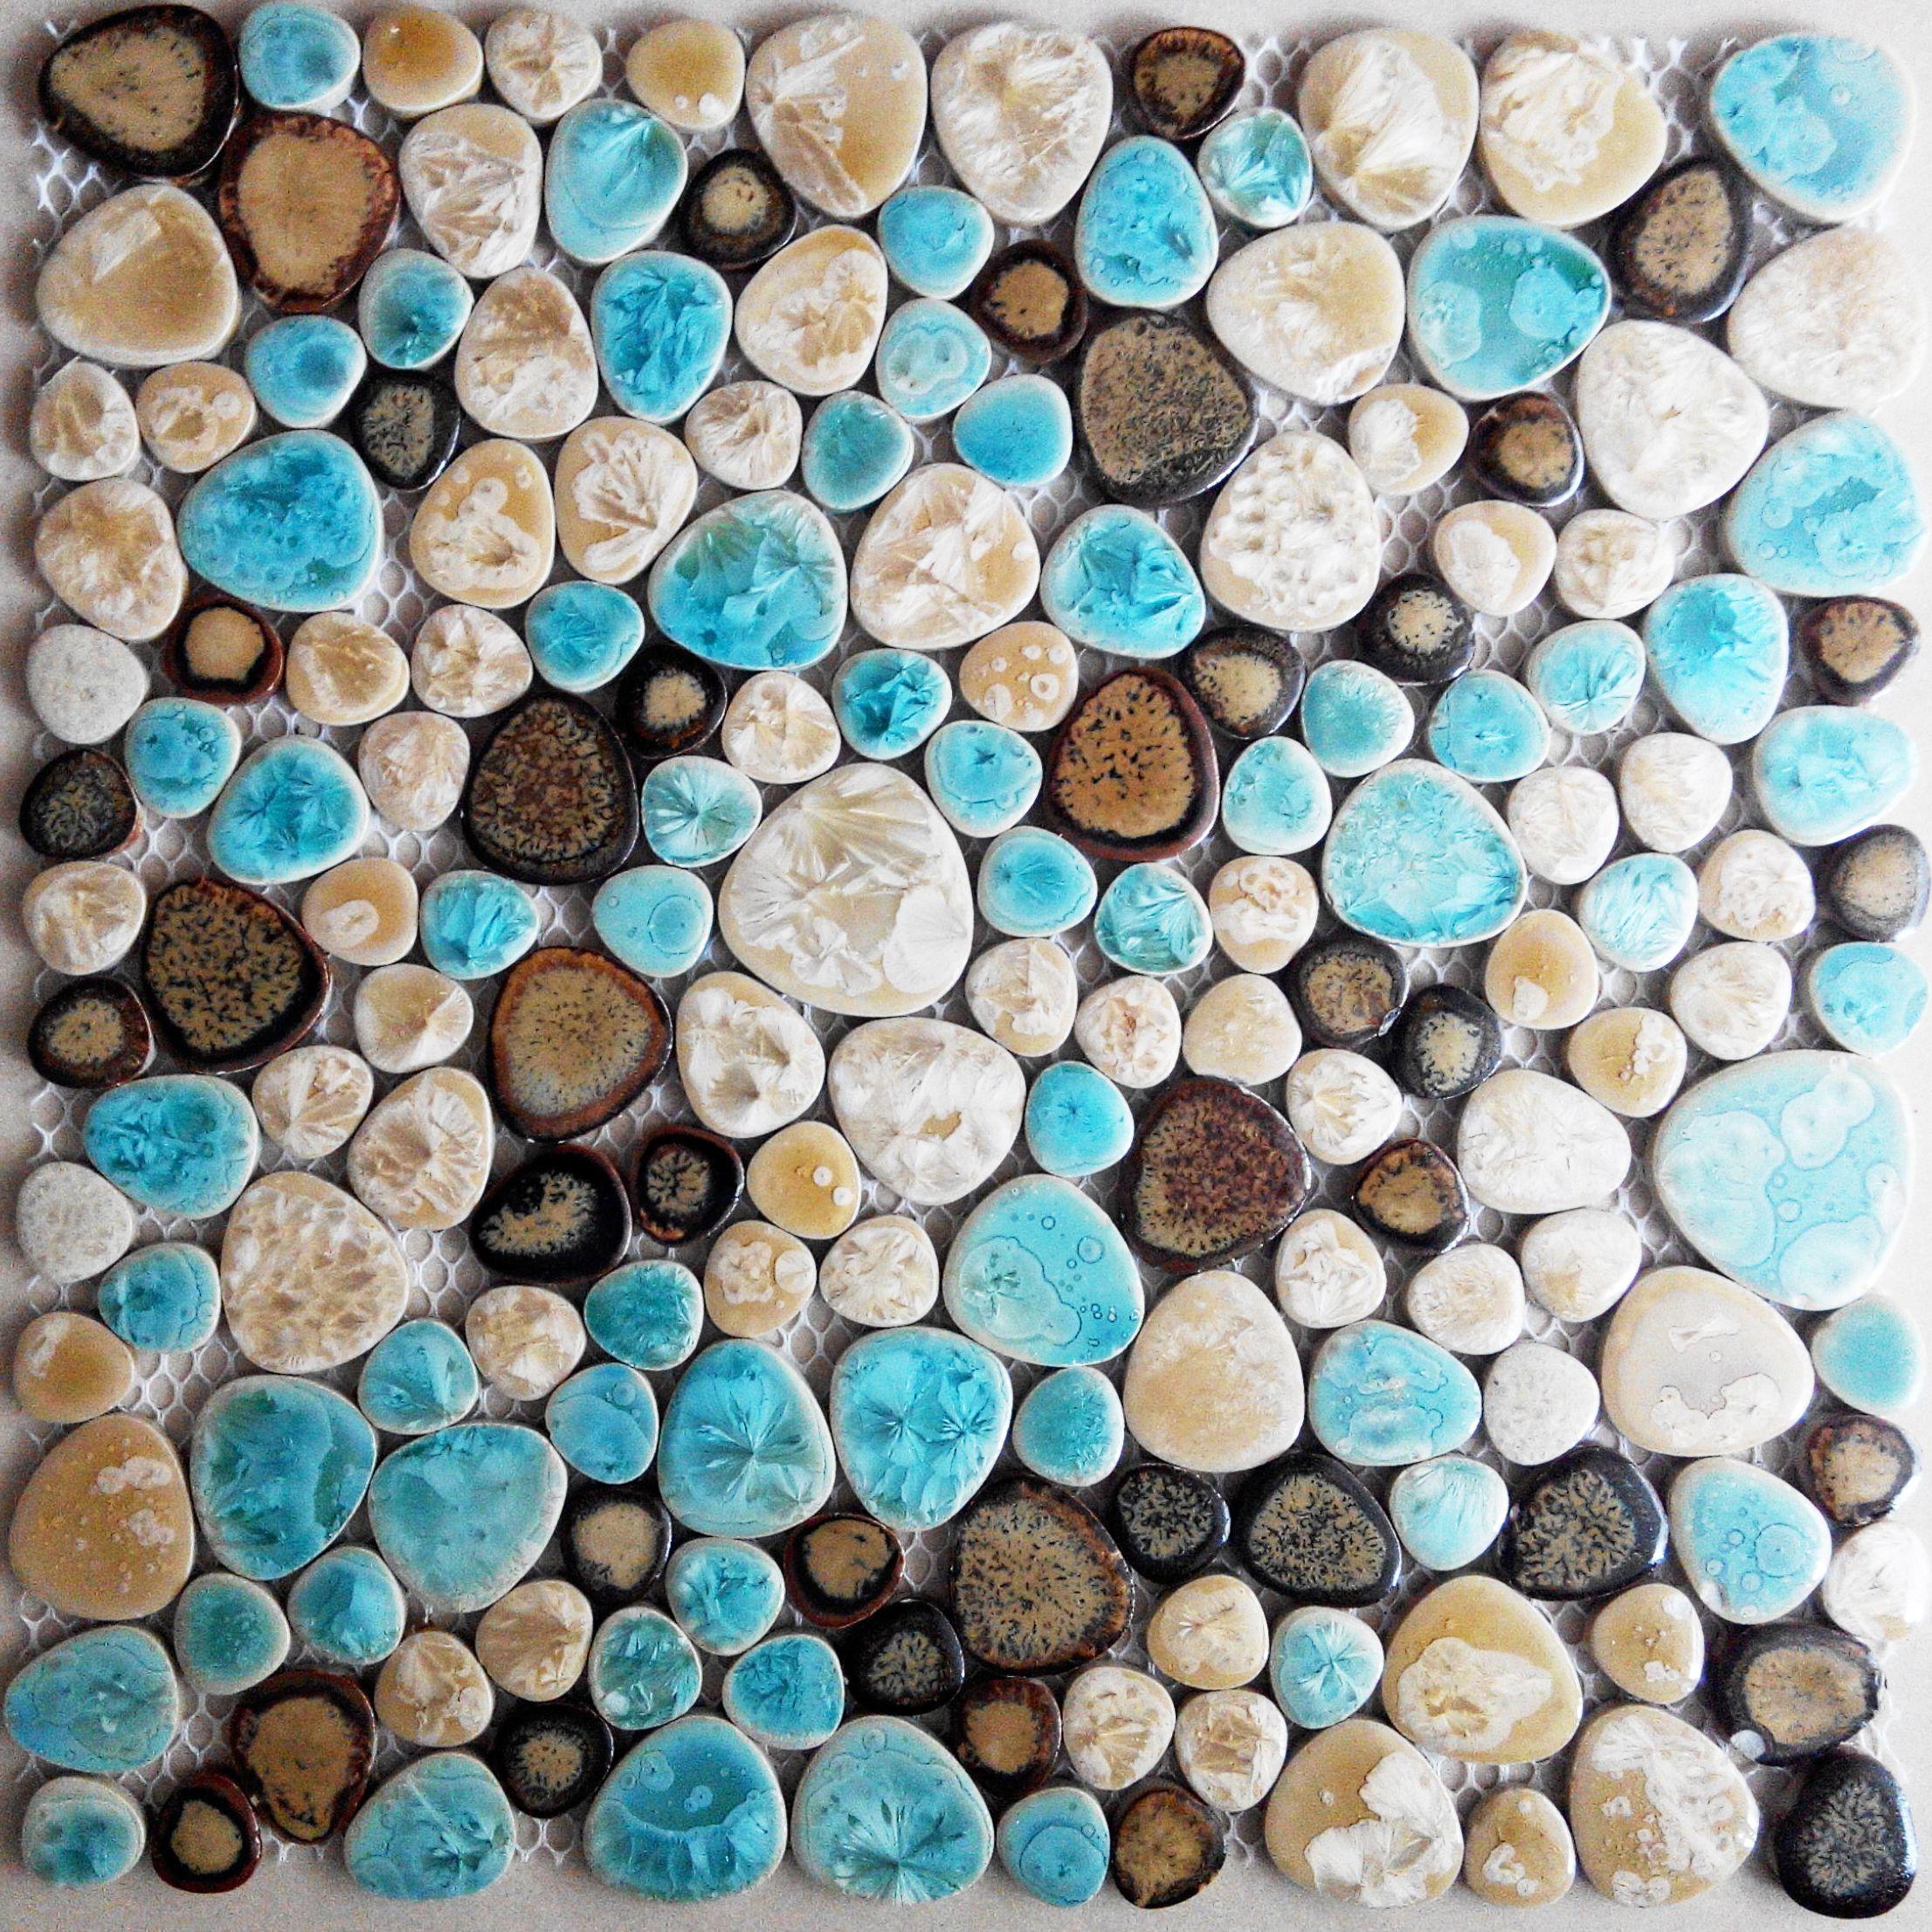 Pebble bathroom floor tiles - Tst Porcelain Pebbles Fambe Bathroom Floor Nature Green Mosaic Tiles Wall Deco Http